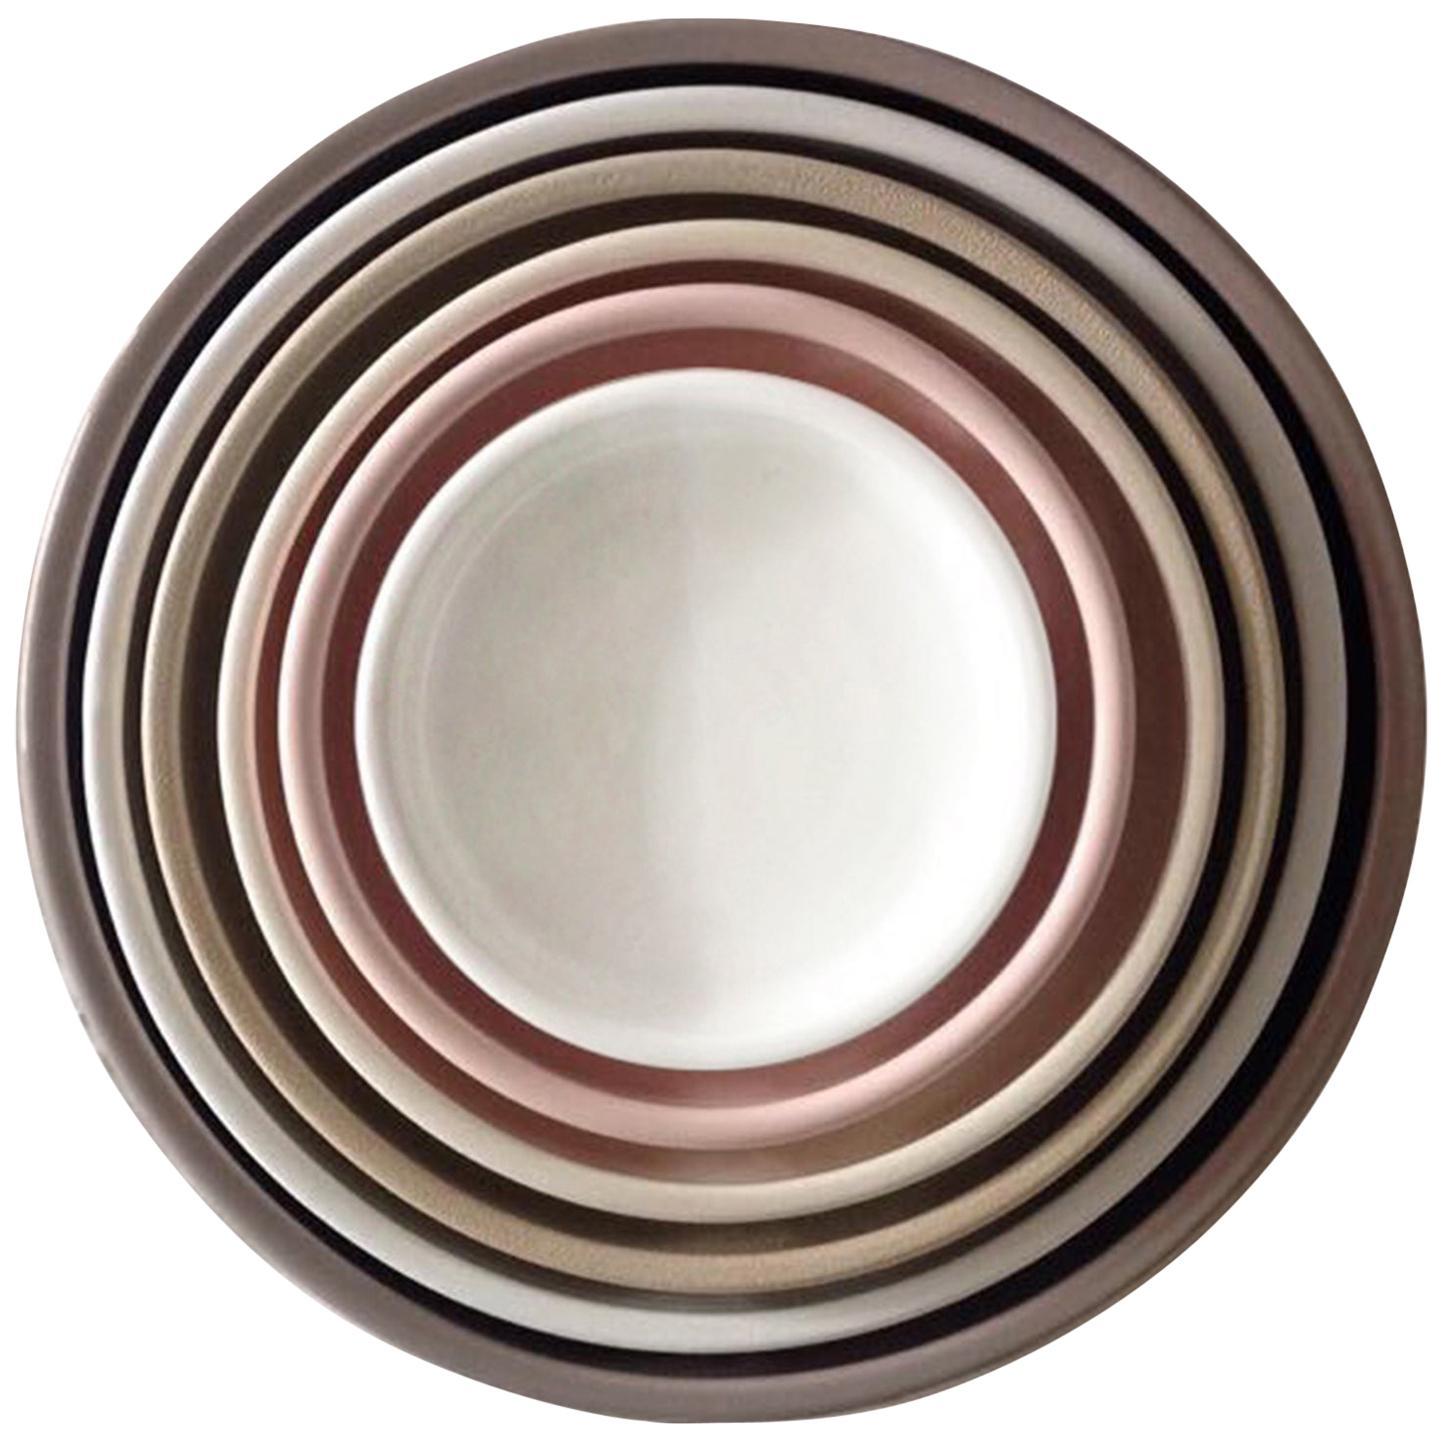 21st Century Ceramic Set of 6 Pieces Serving Plates Neutral Tones Handmade